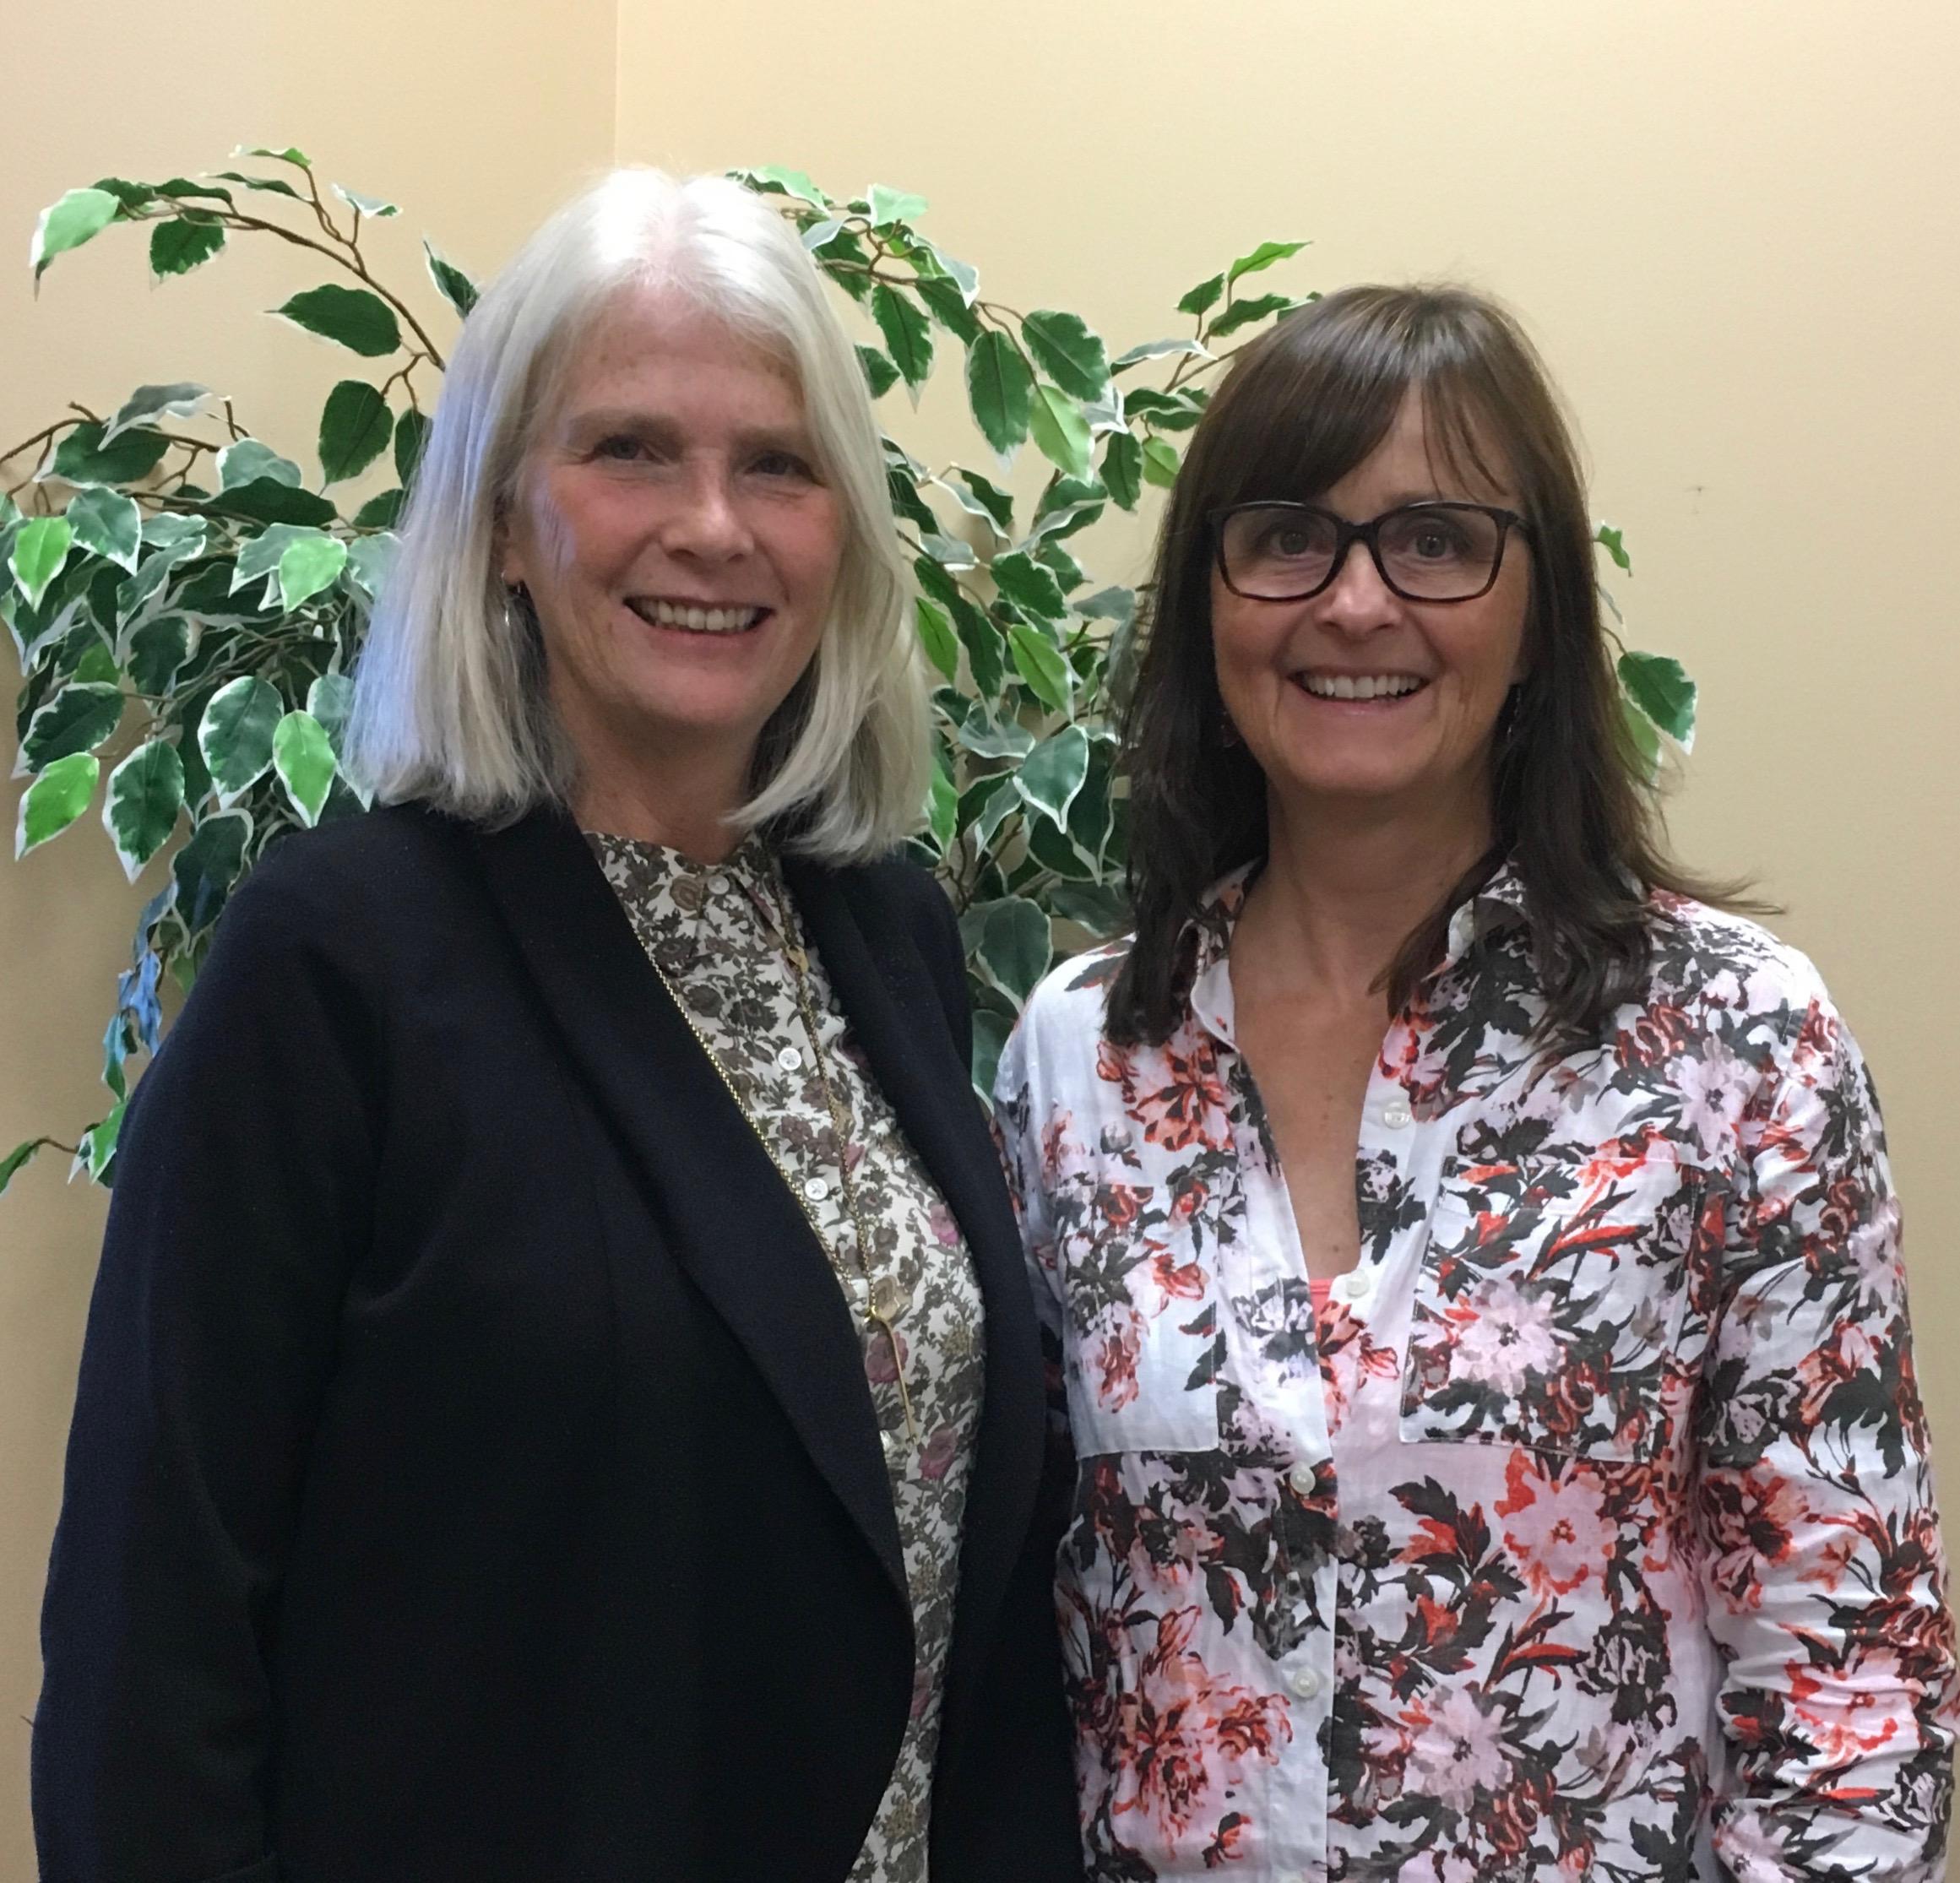 Glenda Britton (left) and Michele Welch (right).